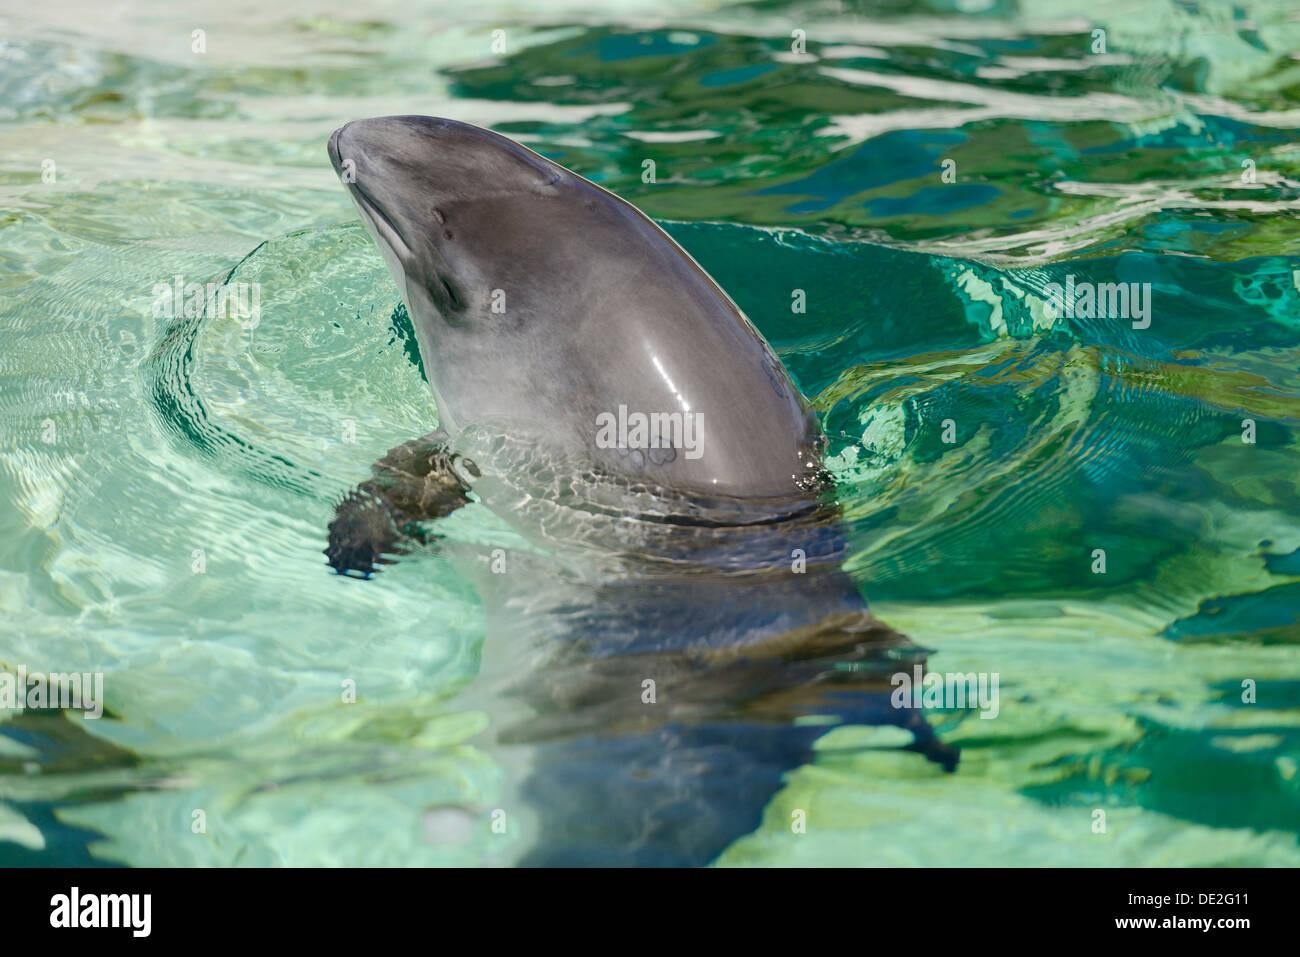 Harbour Porpoise (Phocoena phocoena), captive, Ecomare, De Koog, Texel, West Frisian Islands, province of North Holland - Stock Image